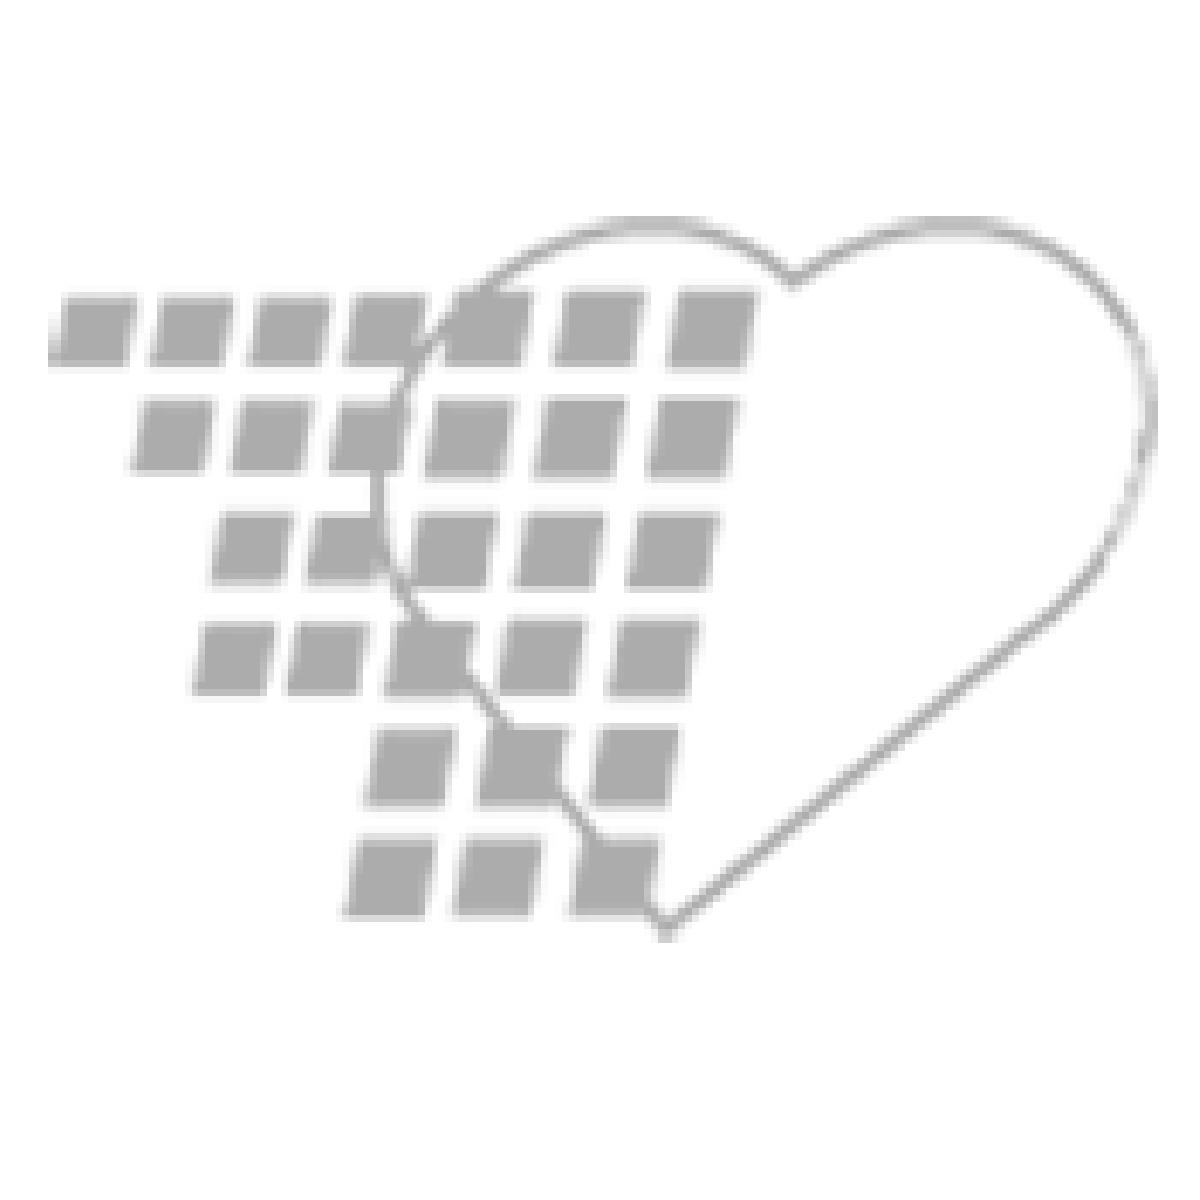 07-71-0111 Endotracheal Tube Cuffed 5.0